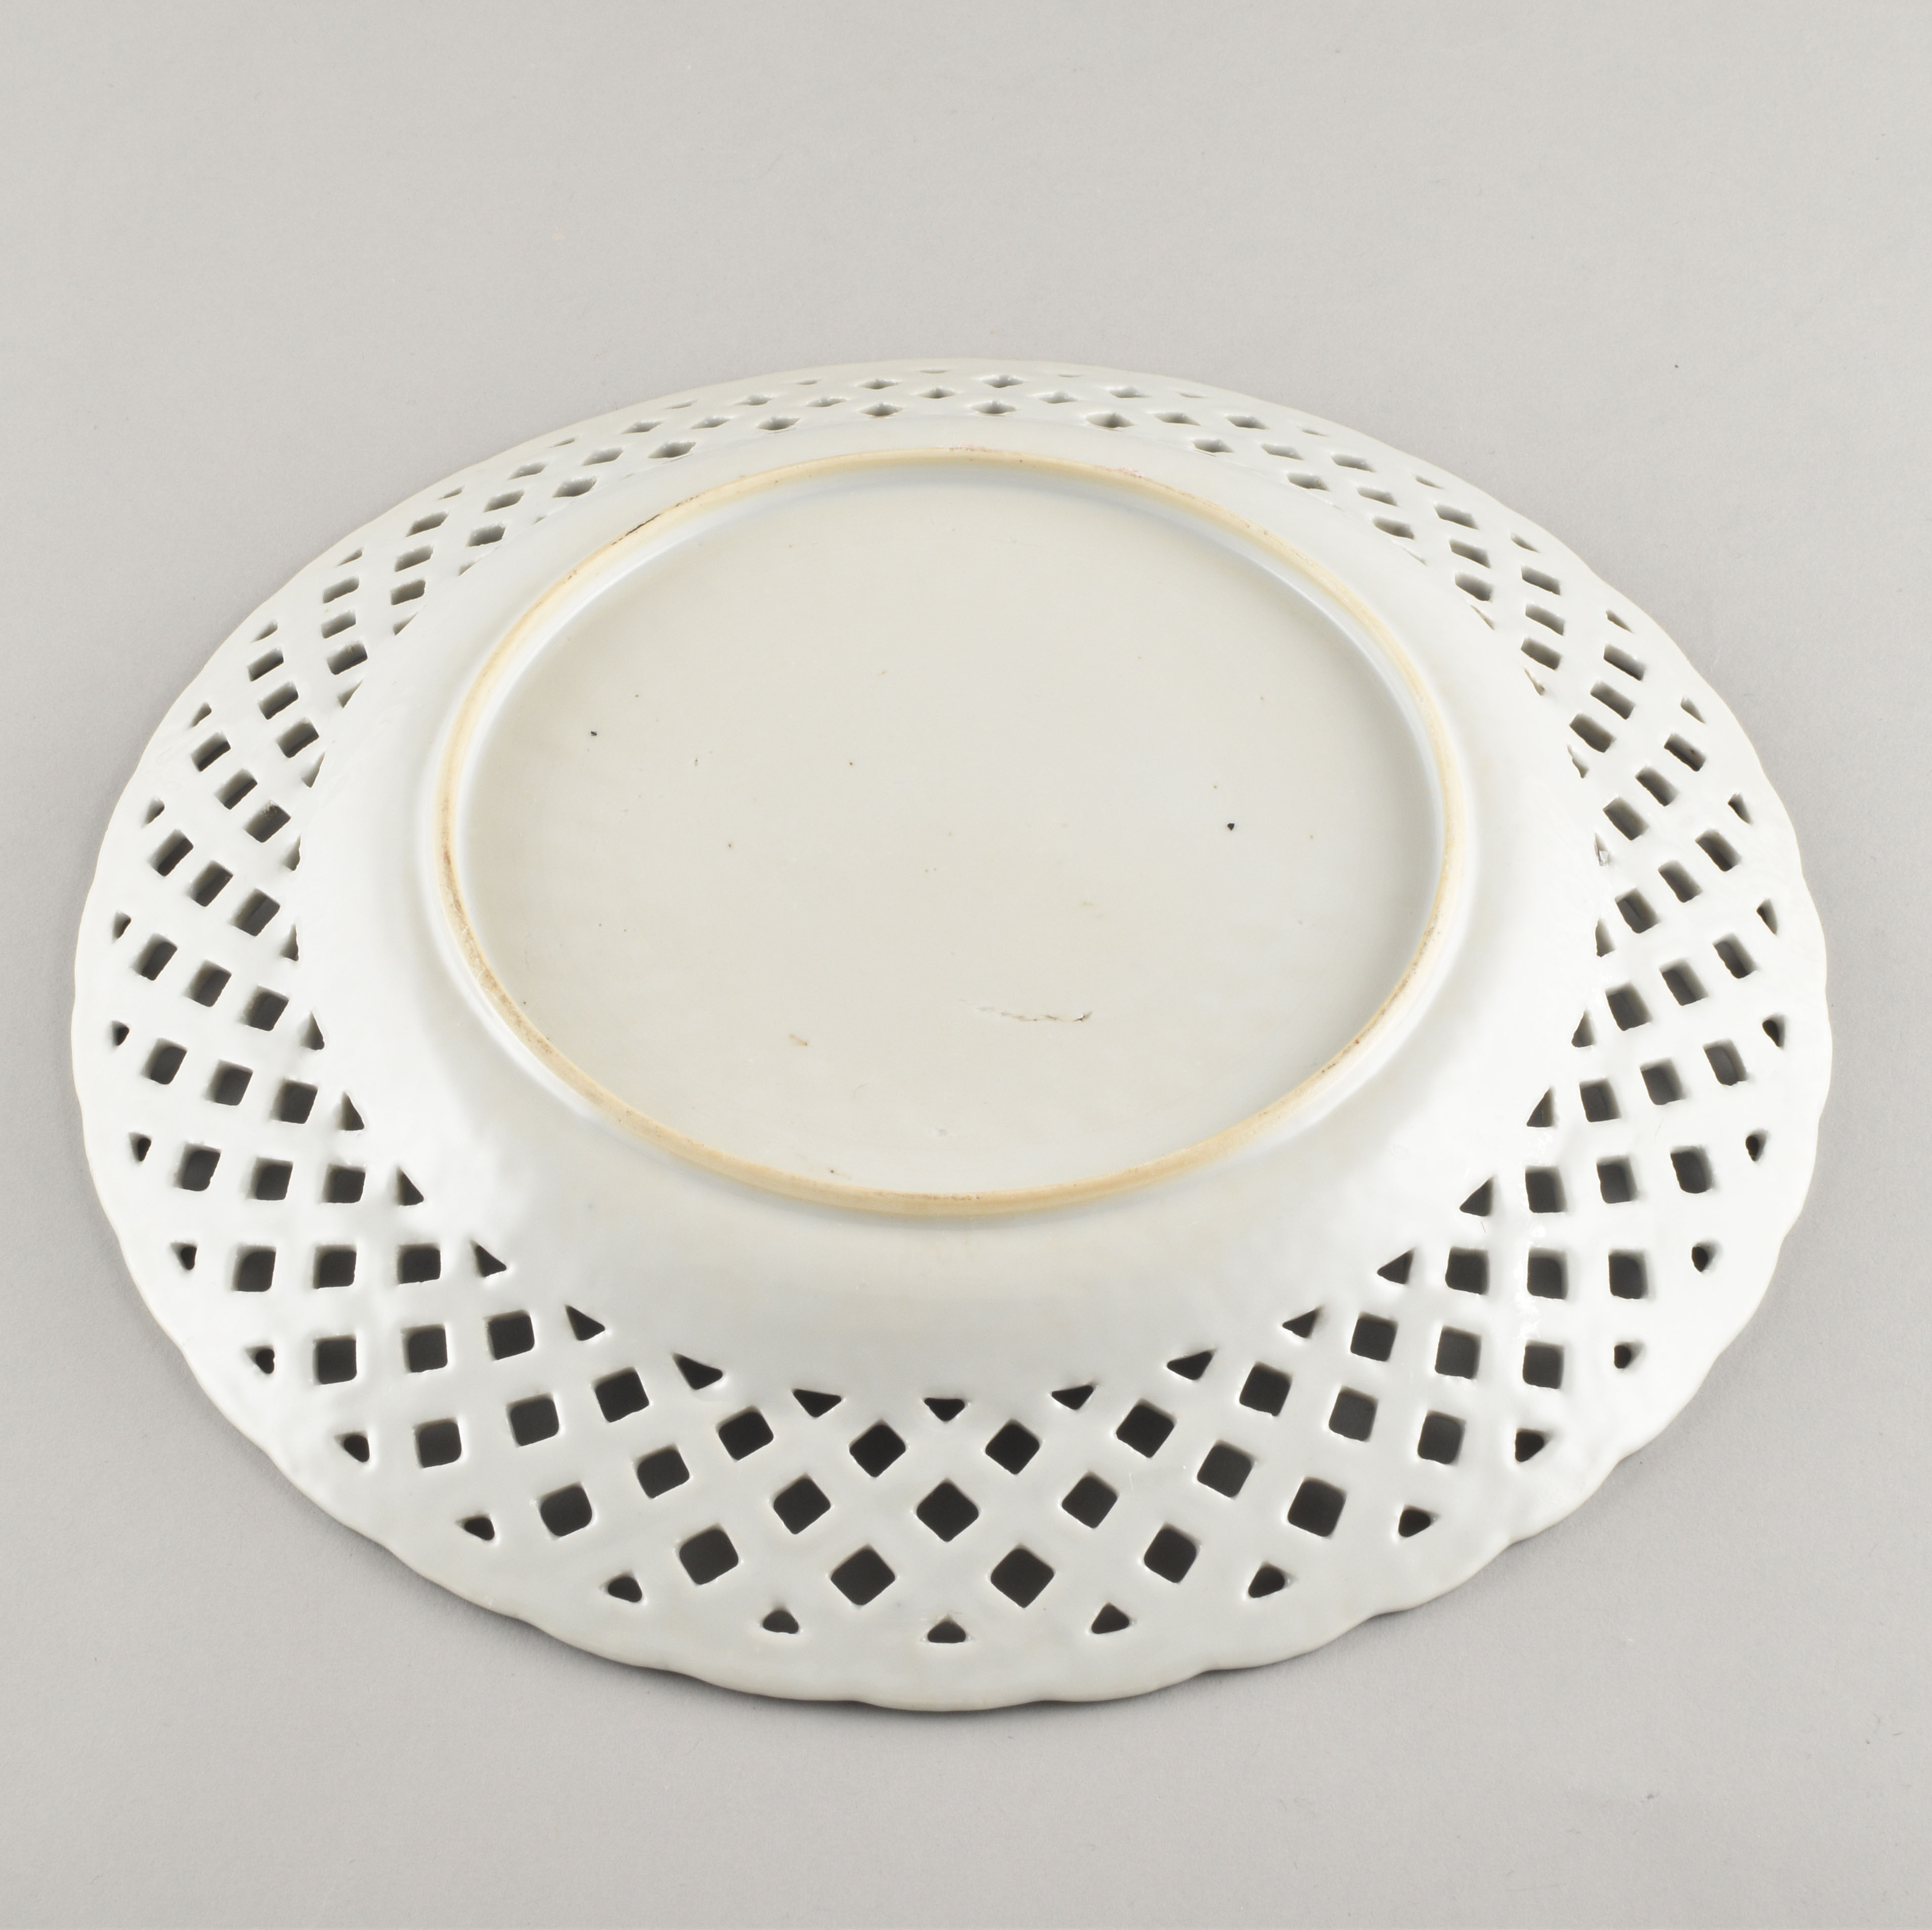 Porcelaine Qianlong (1735-1795), circa 1765/1770, Chine